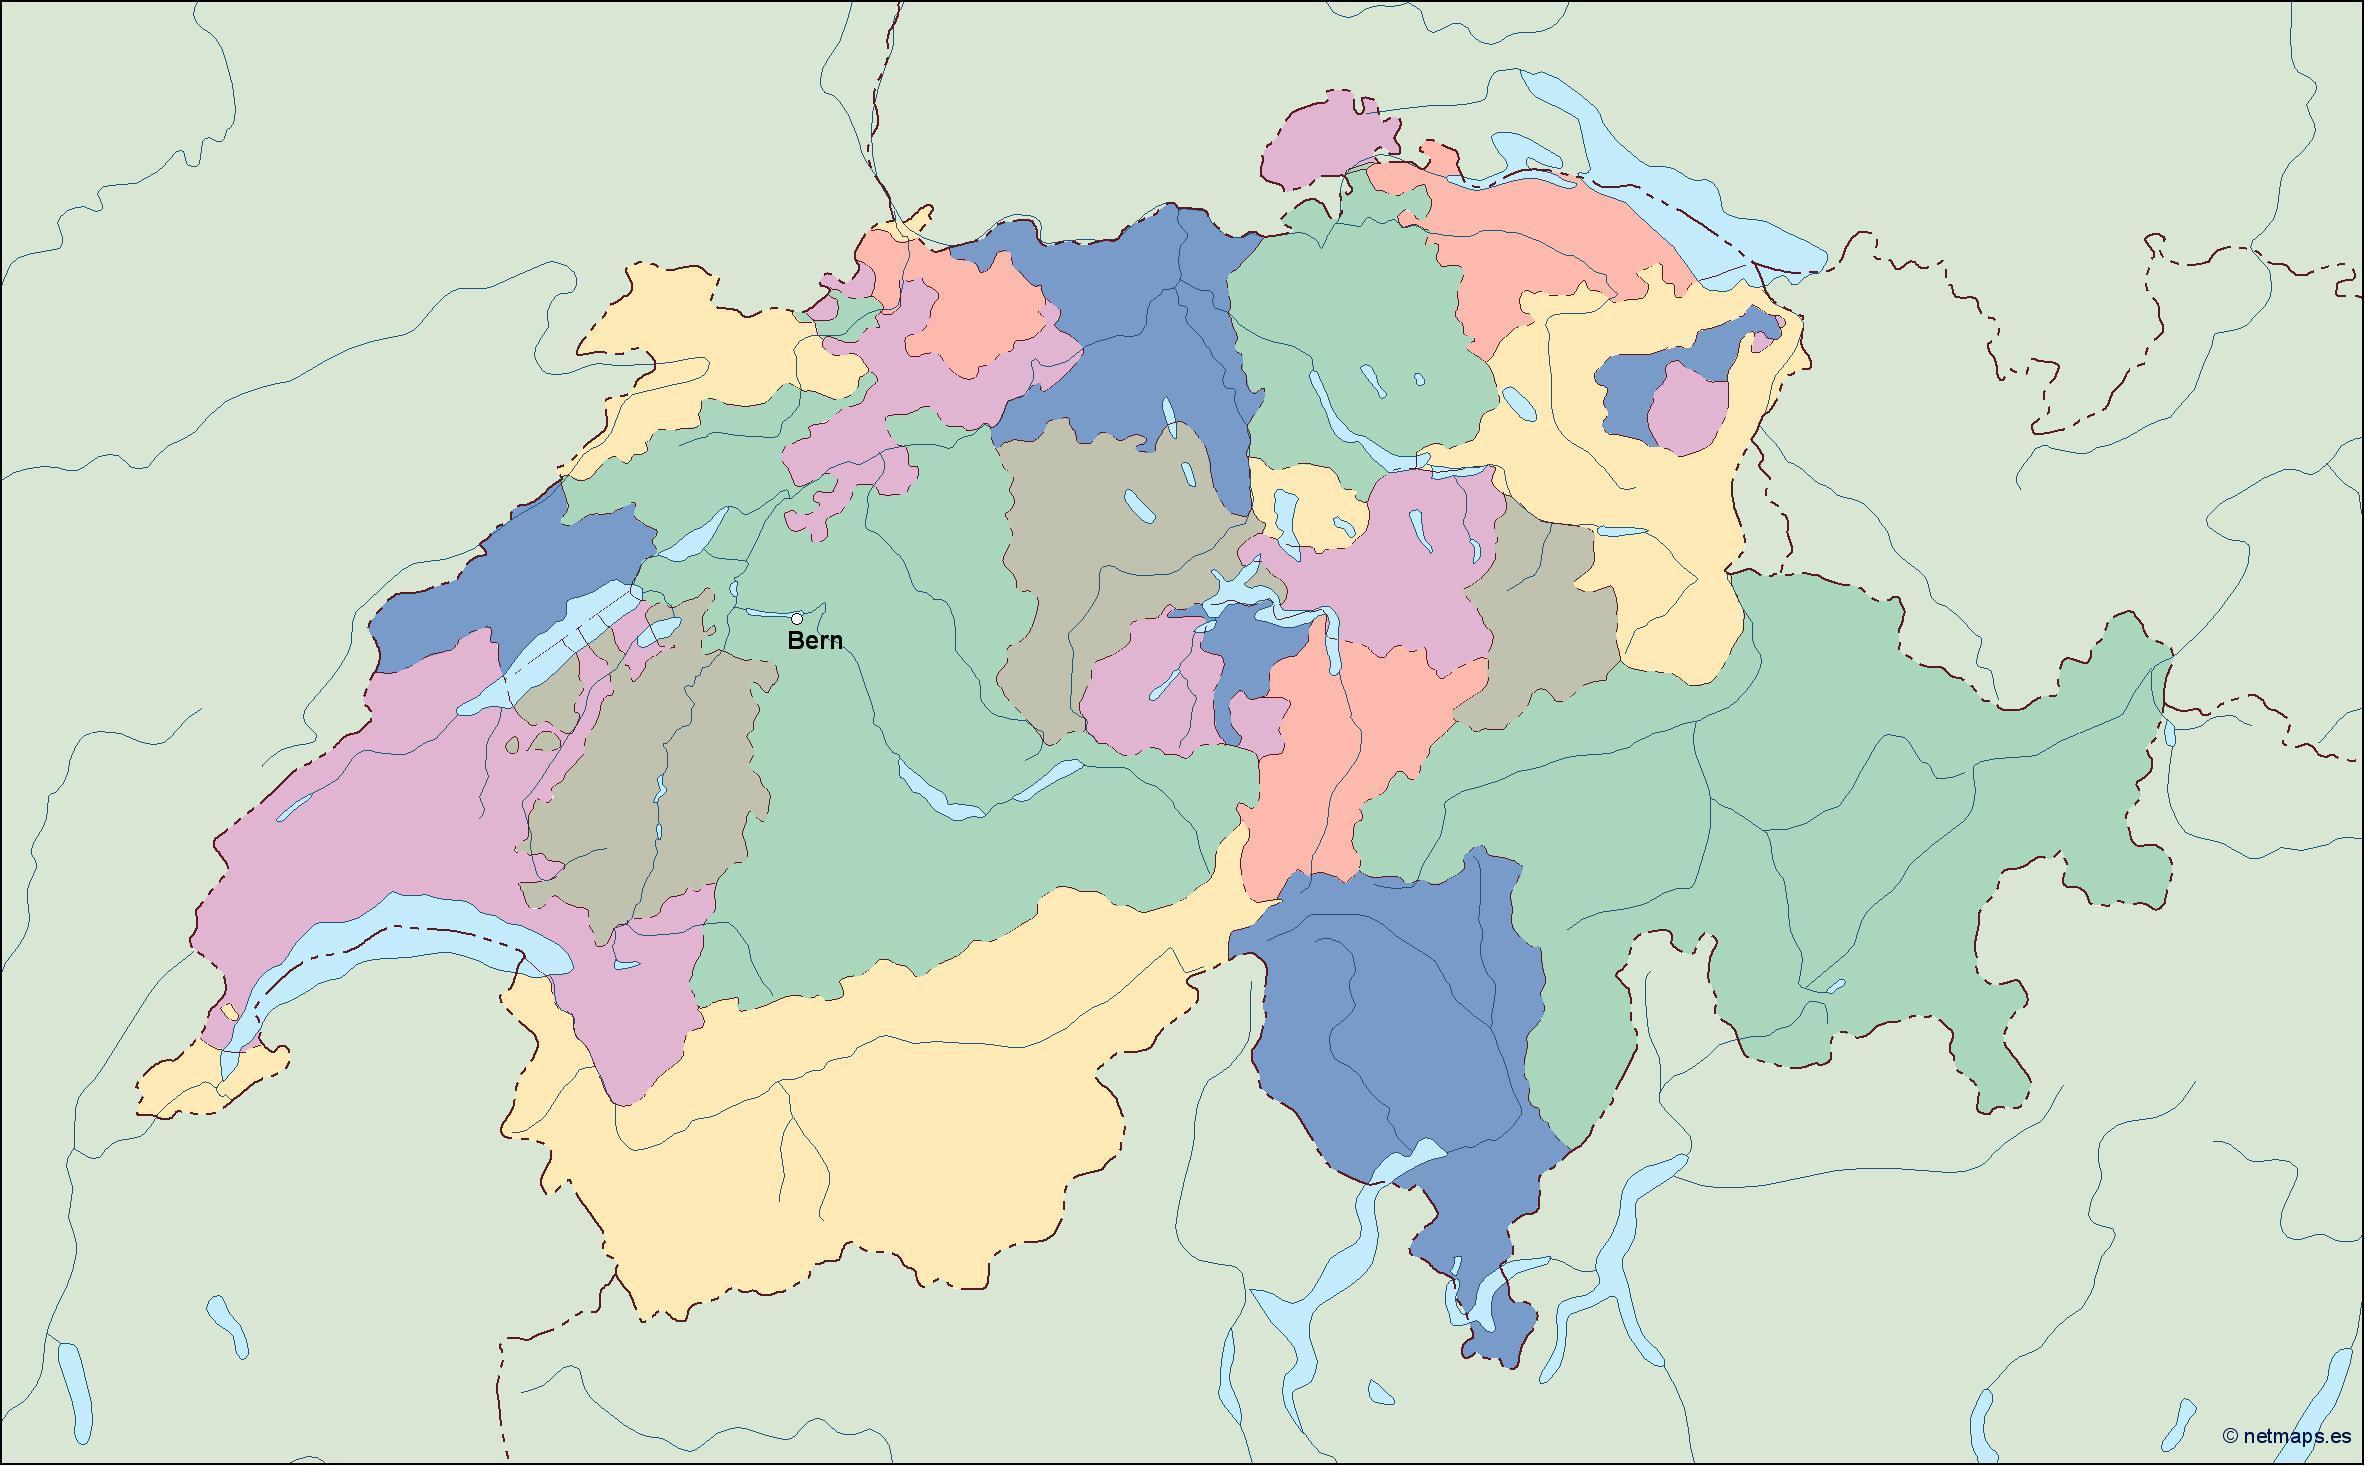 Mapa Politico De Suiza.Mapa Politico De Suiza Mapa De Mapa Politico De Suiza